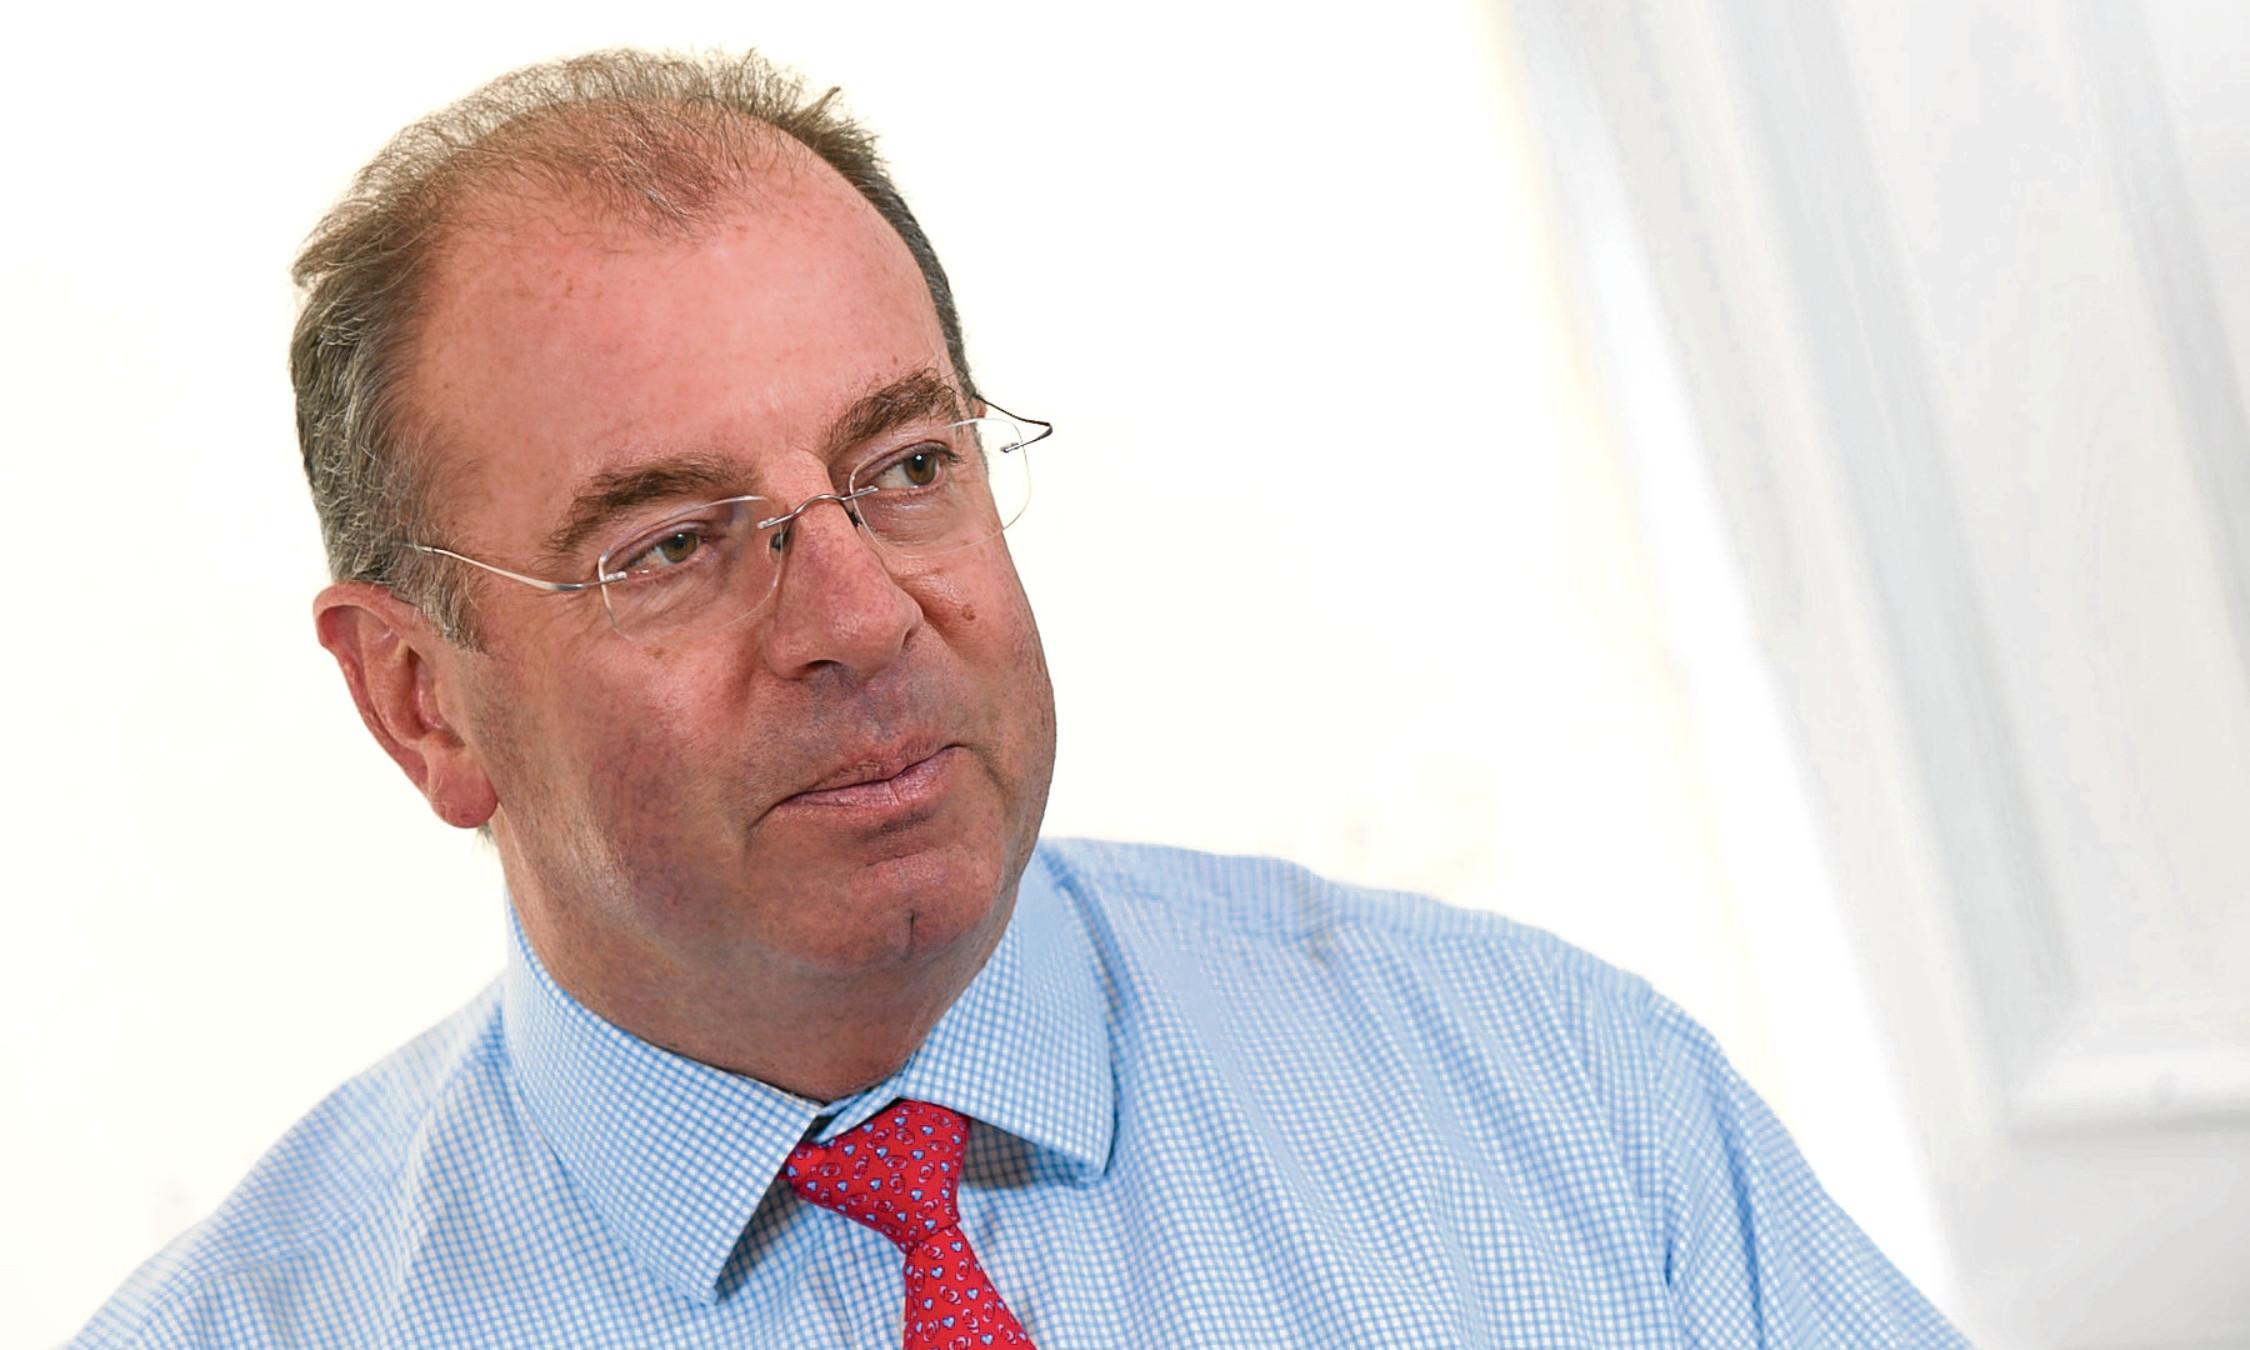 Ian Williams, chairman of Campbell Dallas